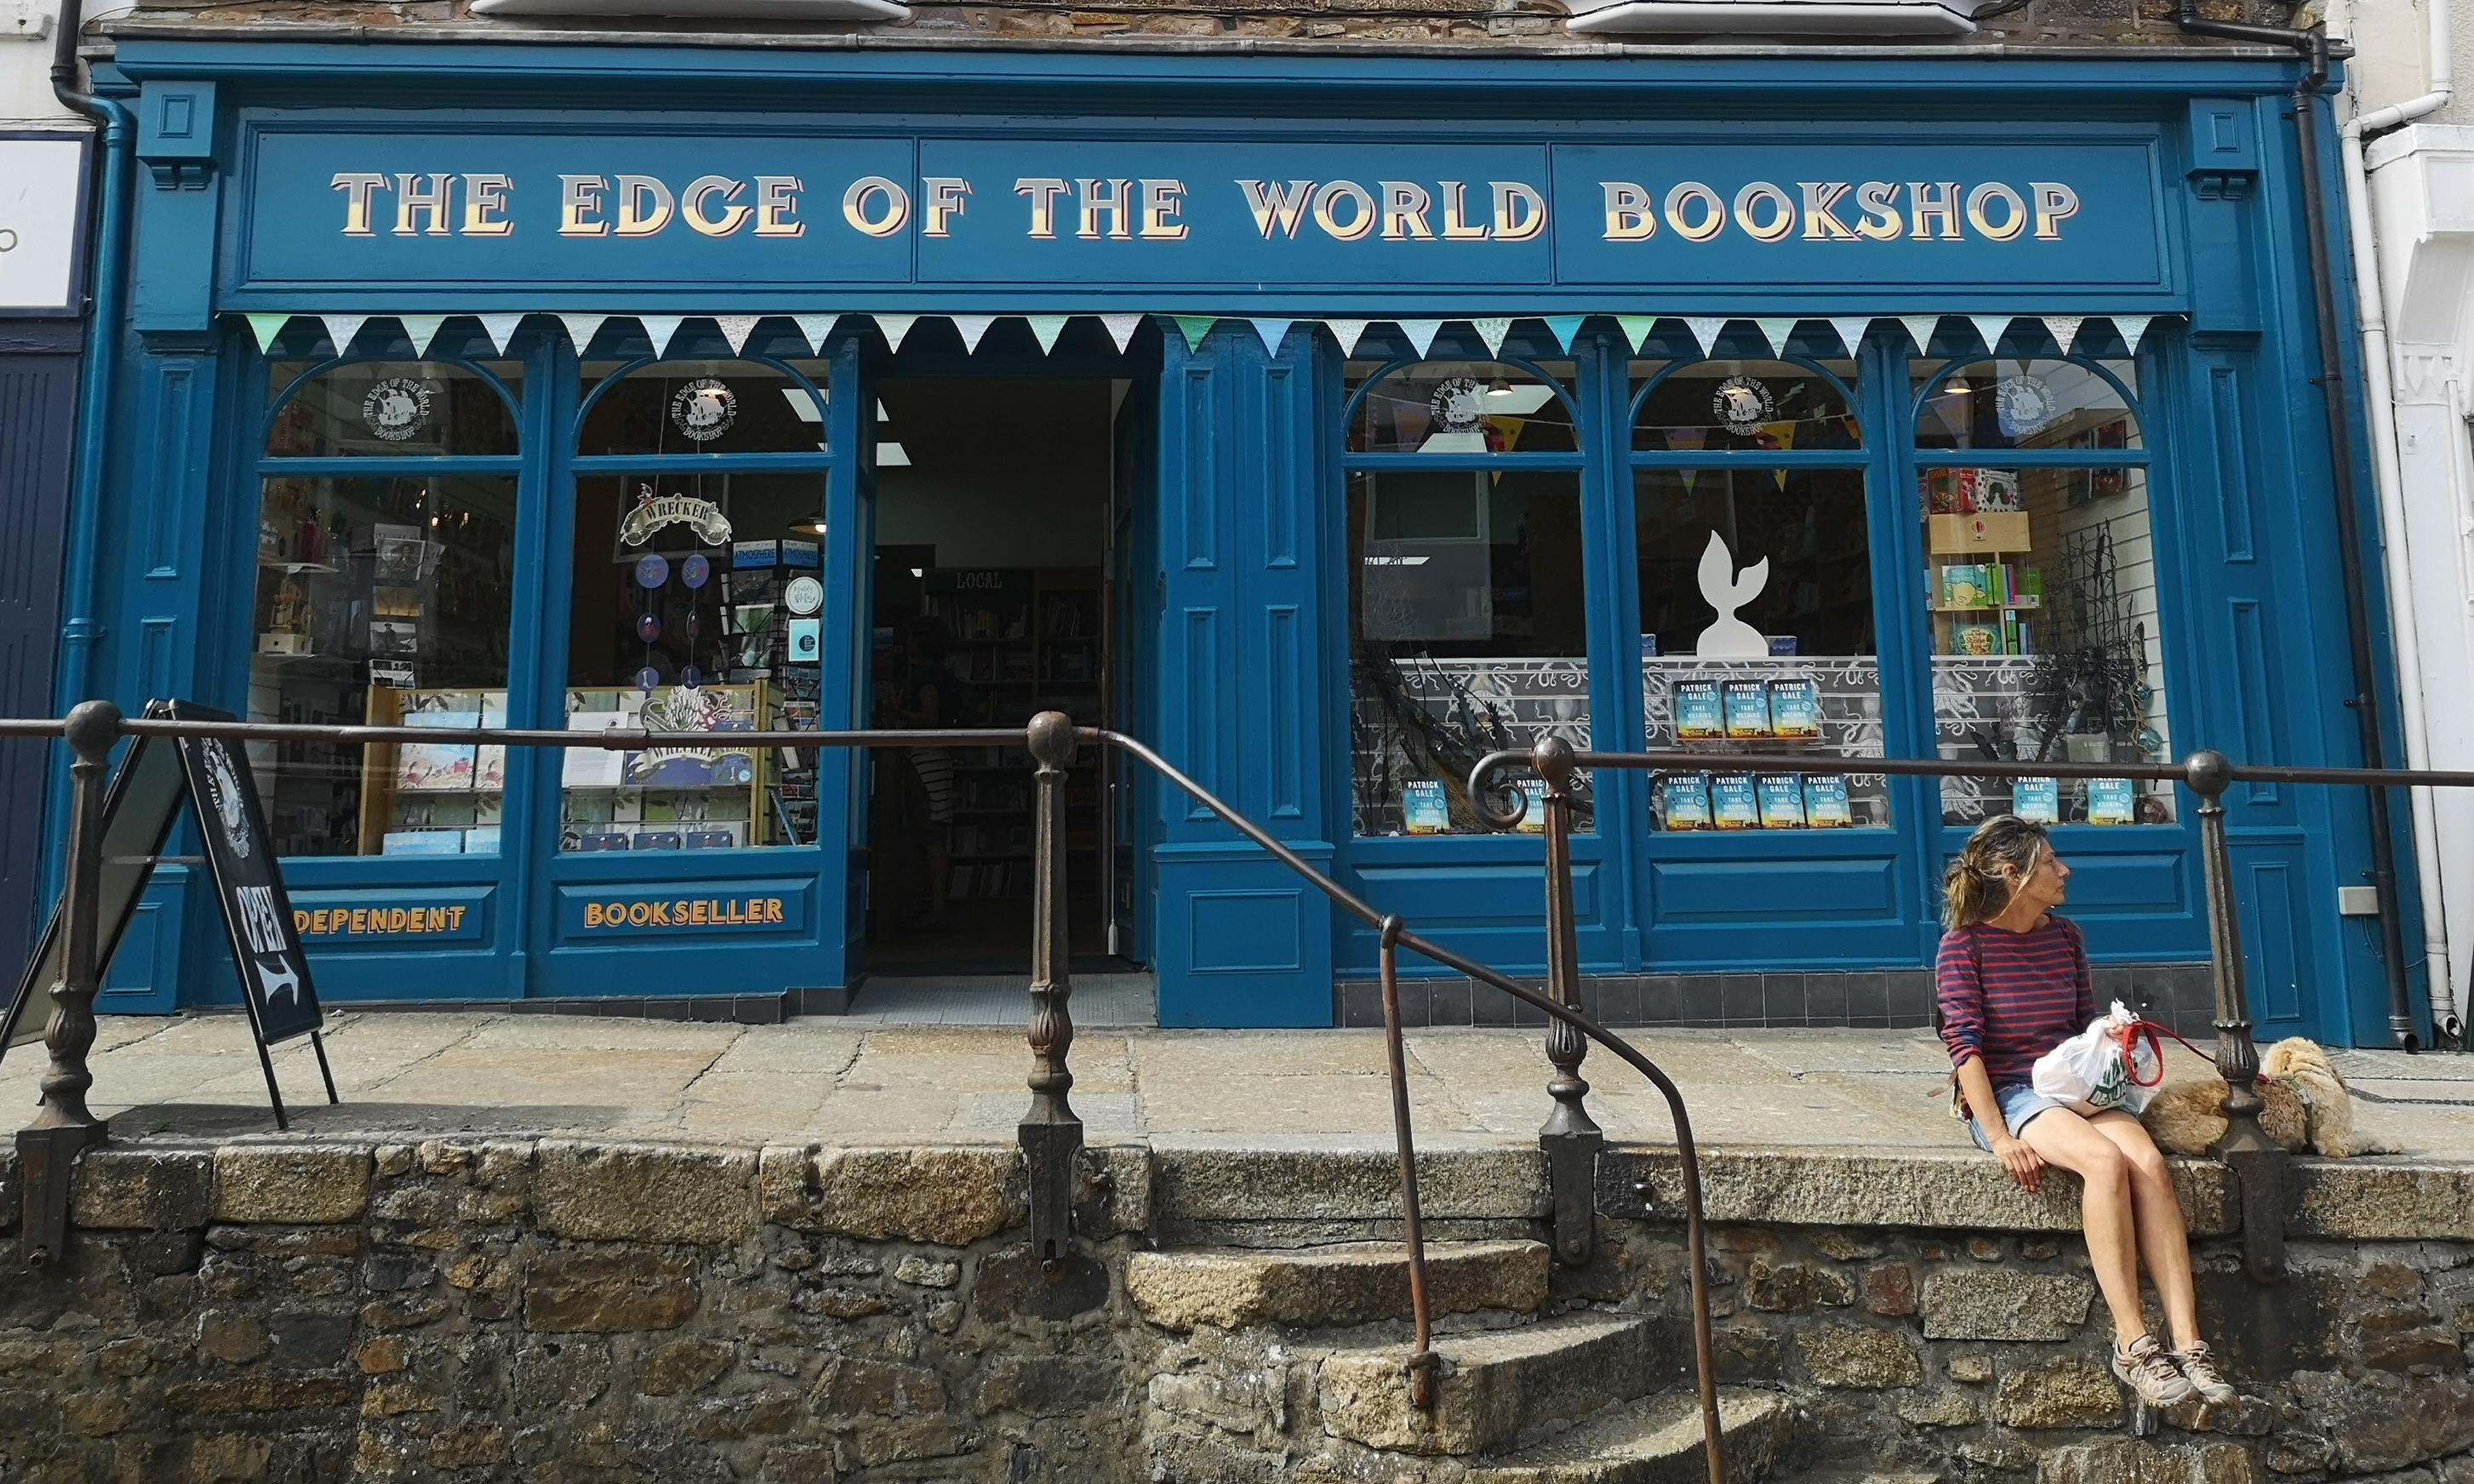 Browse a bookshop: The Edge of the World Bookshop, Penzance